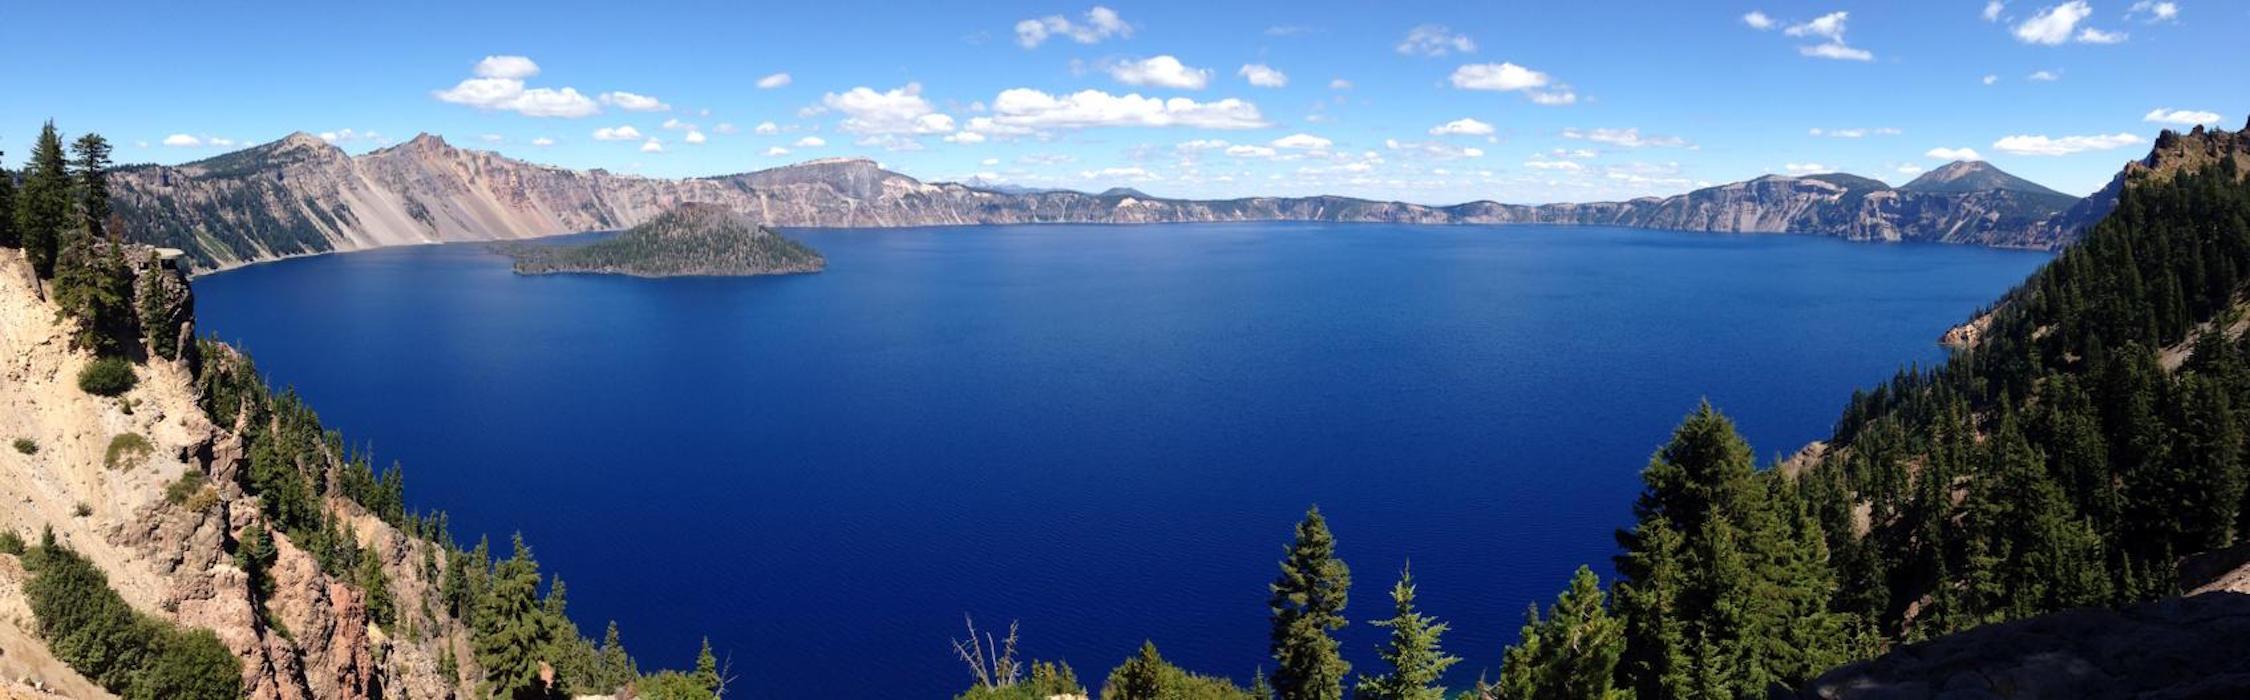 Crater-Lake-Banner.jpg